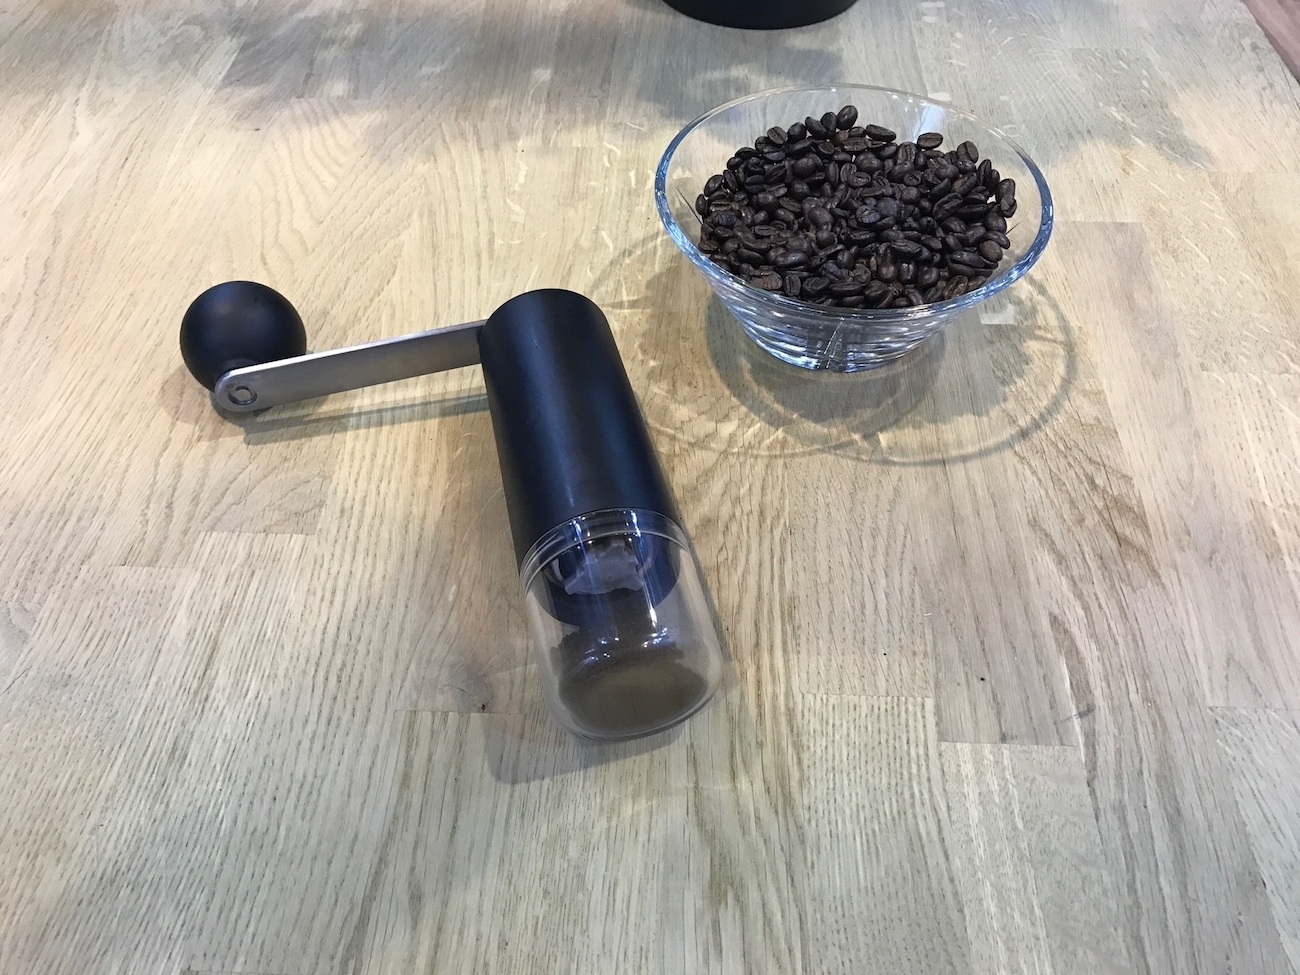 Columbia Versatile Coffee Grinder